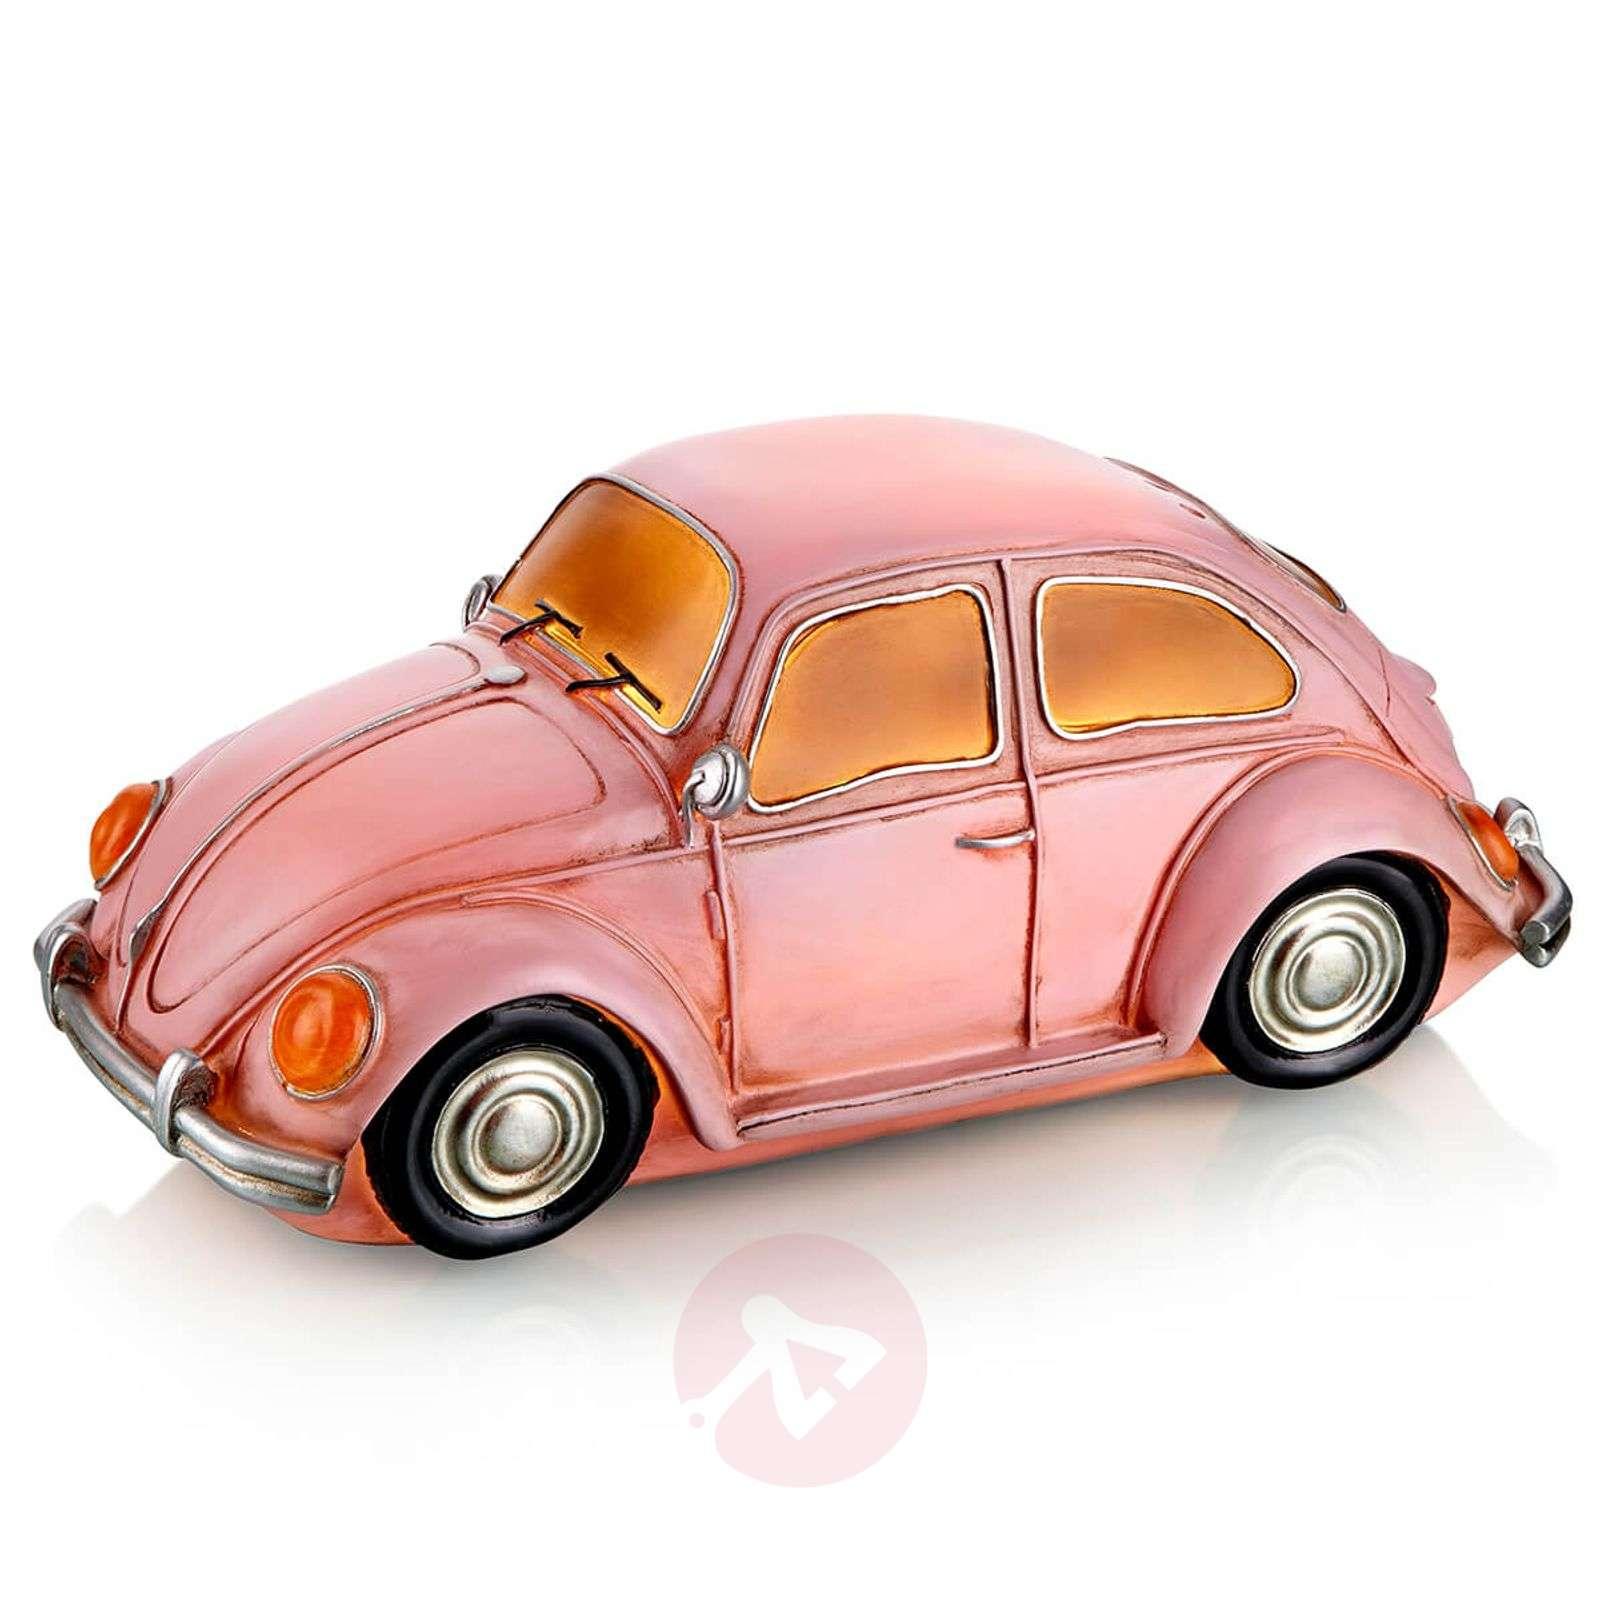 VW Beetle decorative light Nostalgi with timer-6506165-01